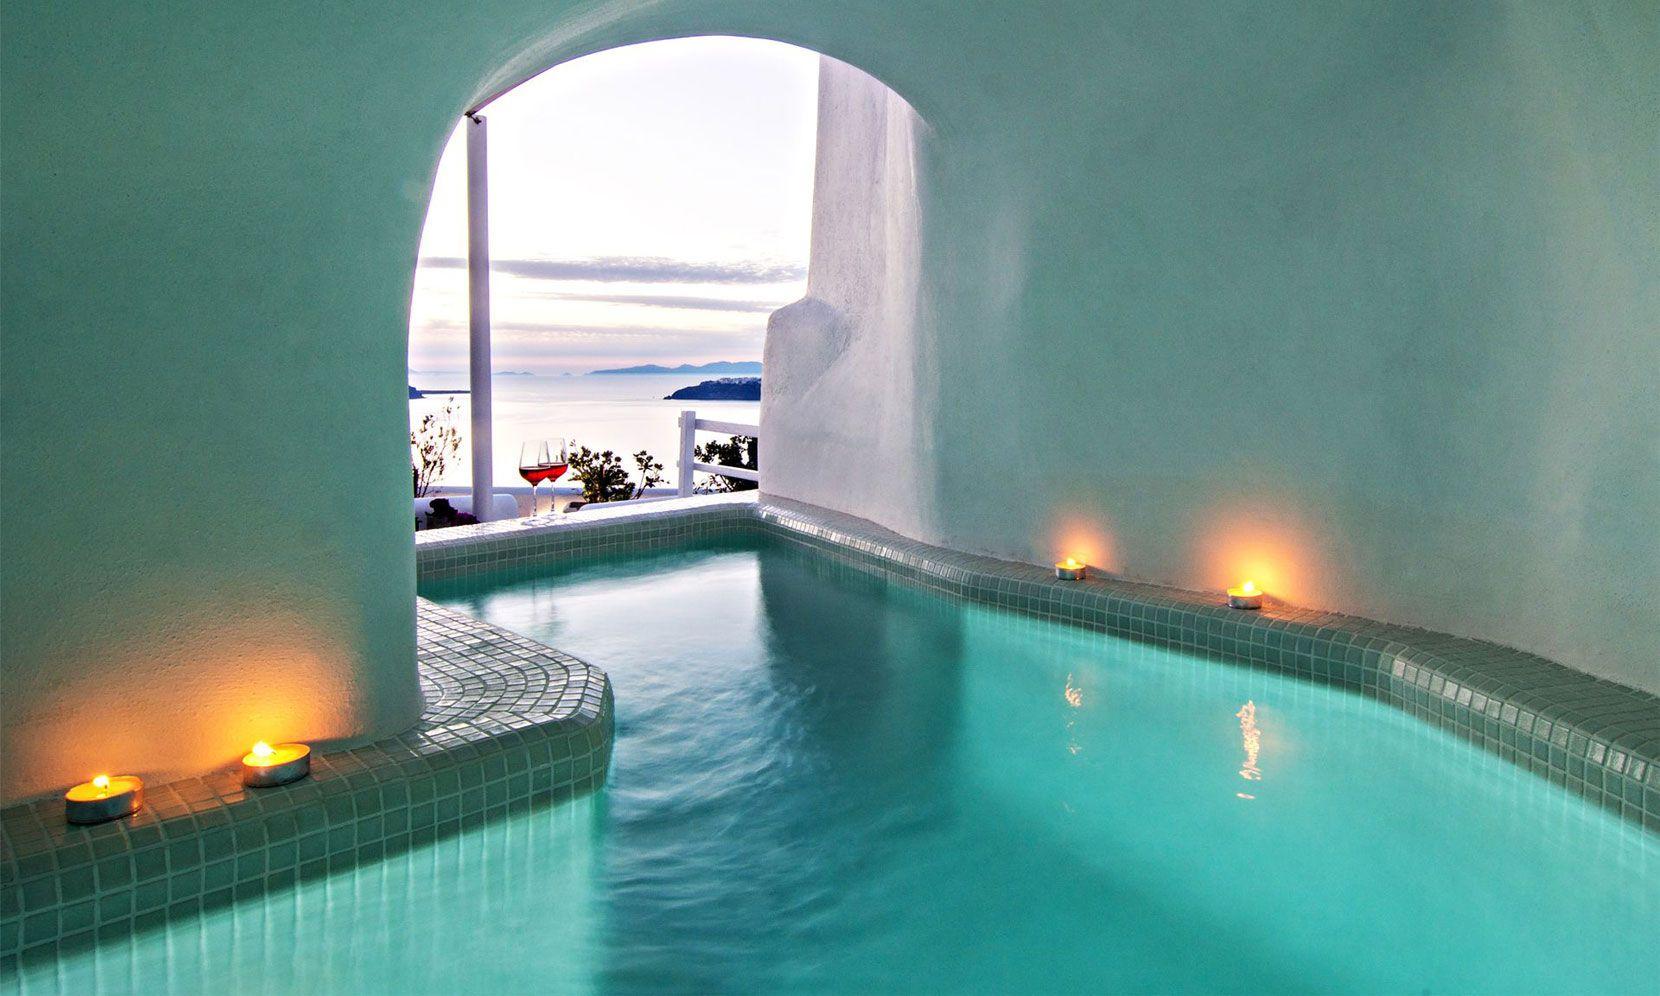 Santorini Villa Althea 2 jumbotron image